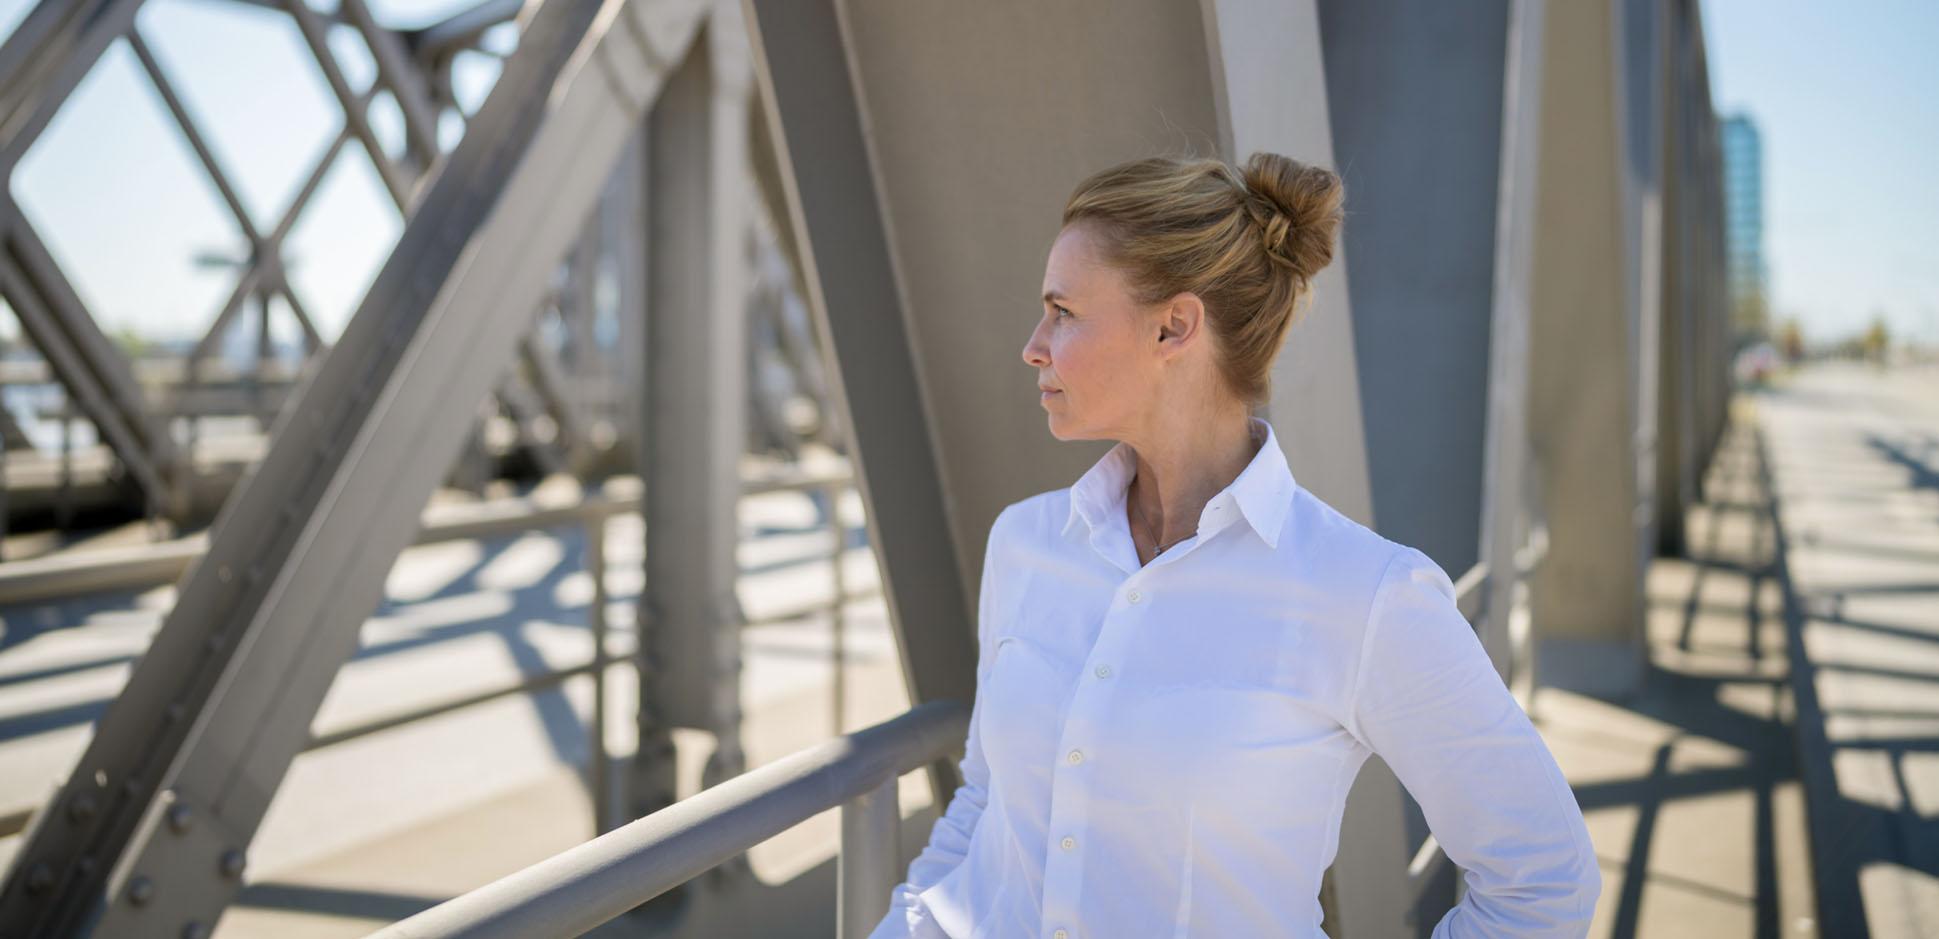 Isabelle Delling Coaching 2020 Workshop Erfolg durch Praesenz